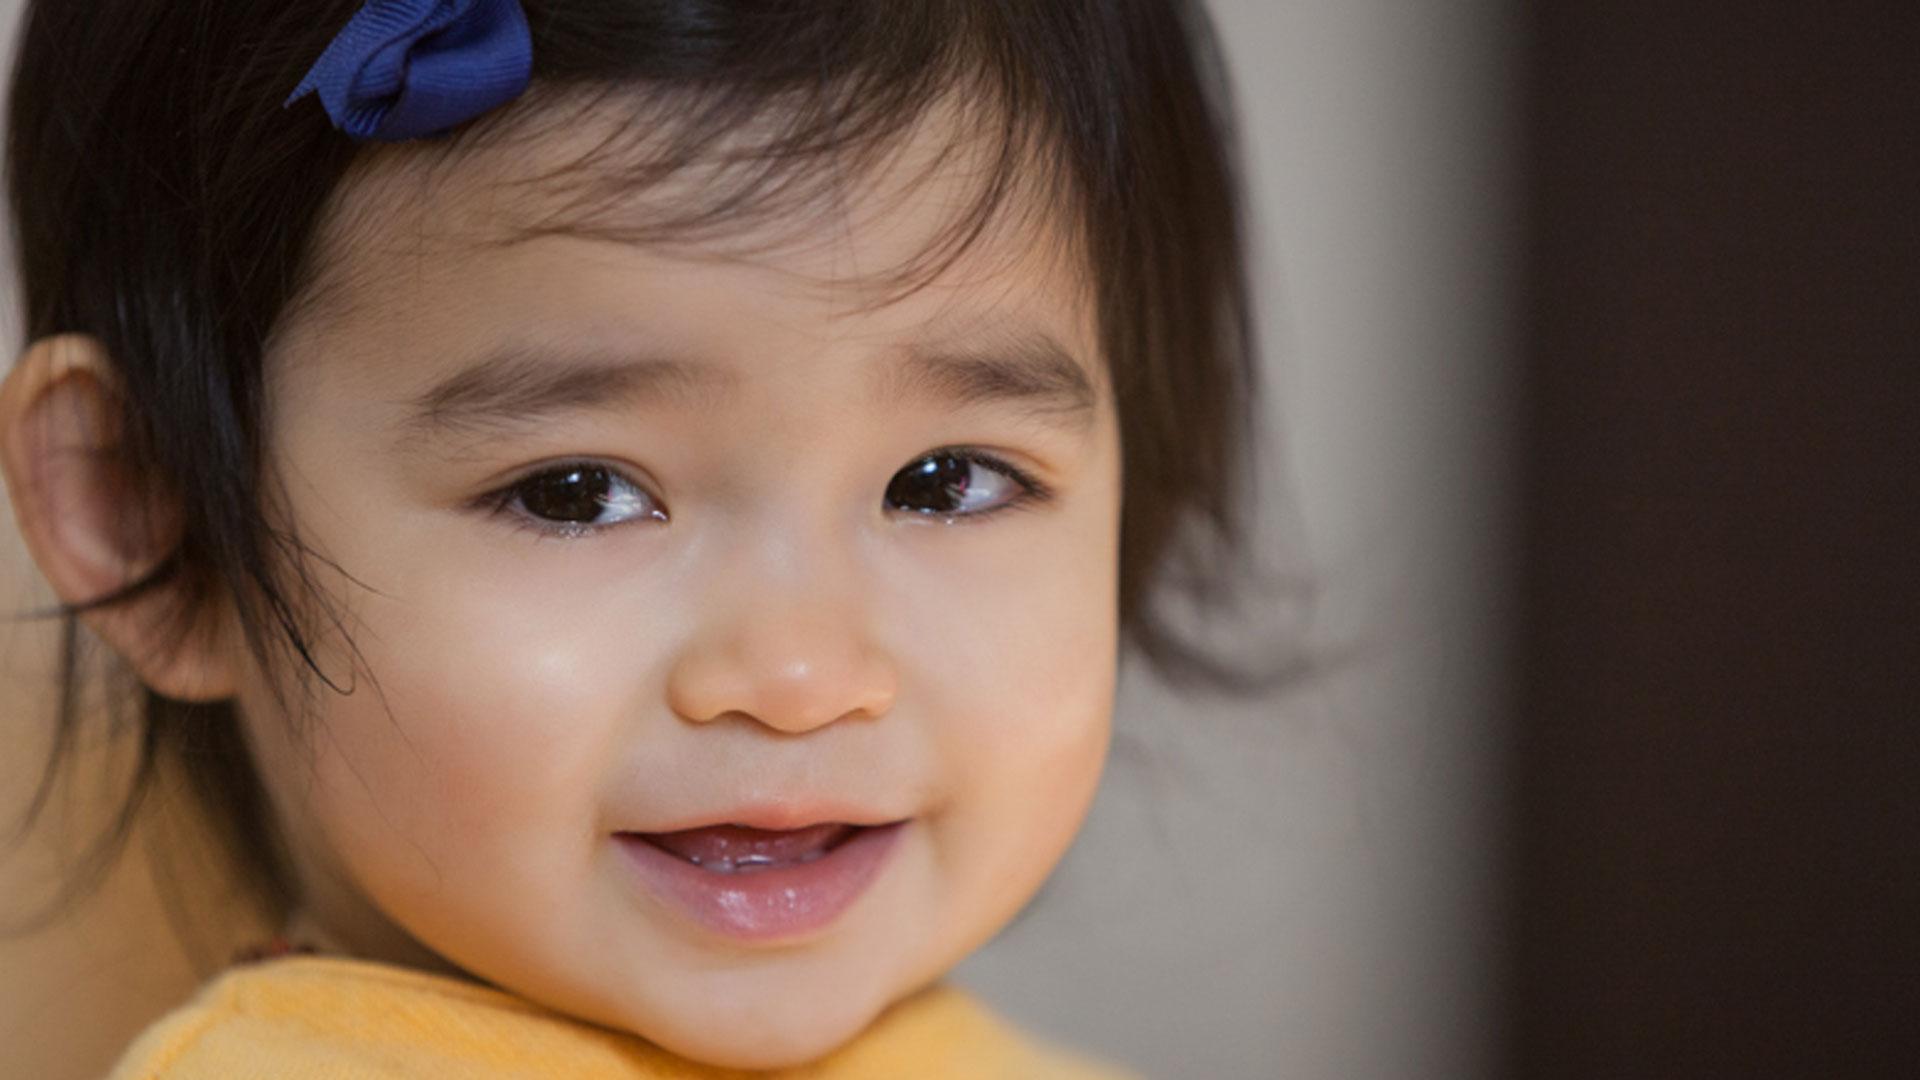 A cute toddler